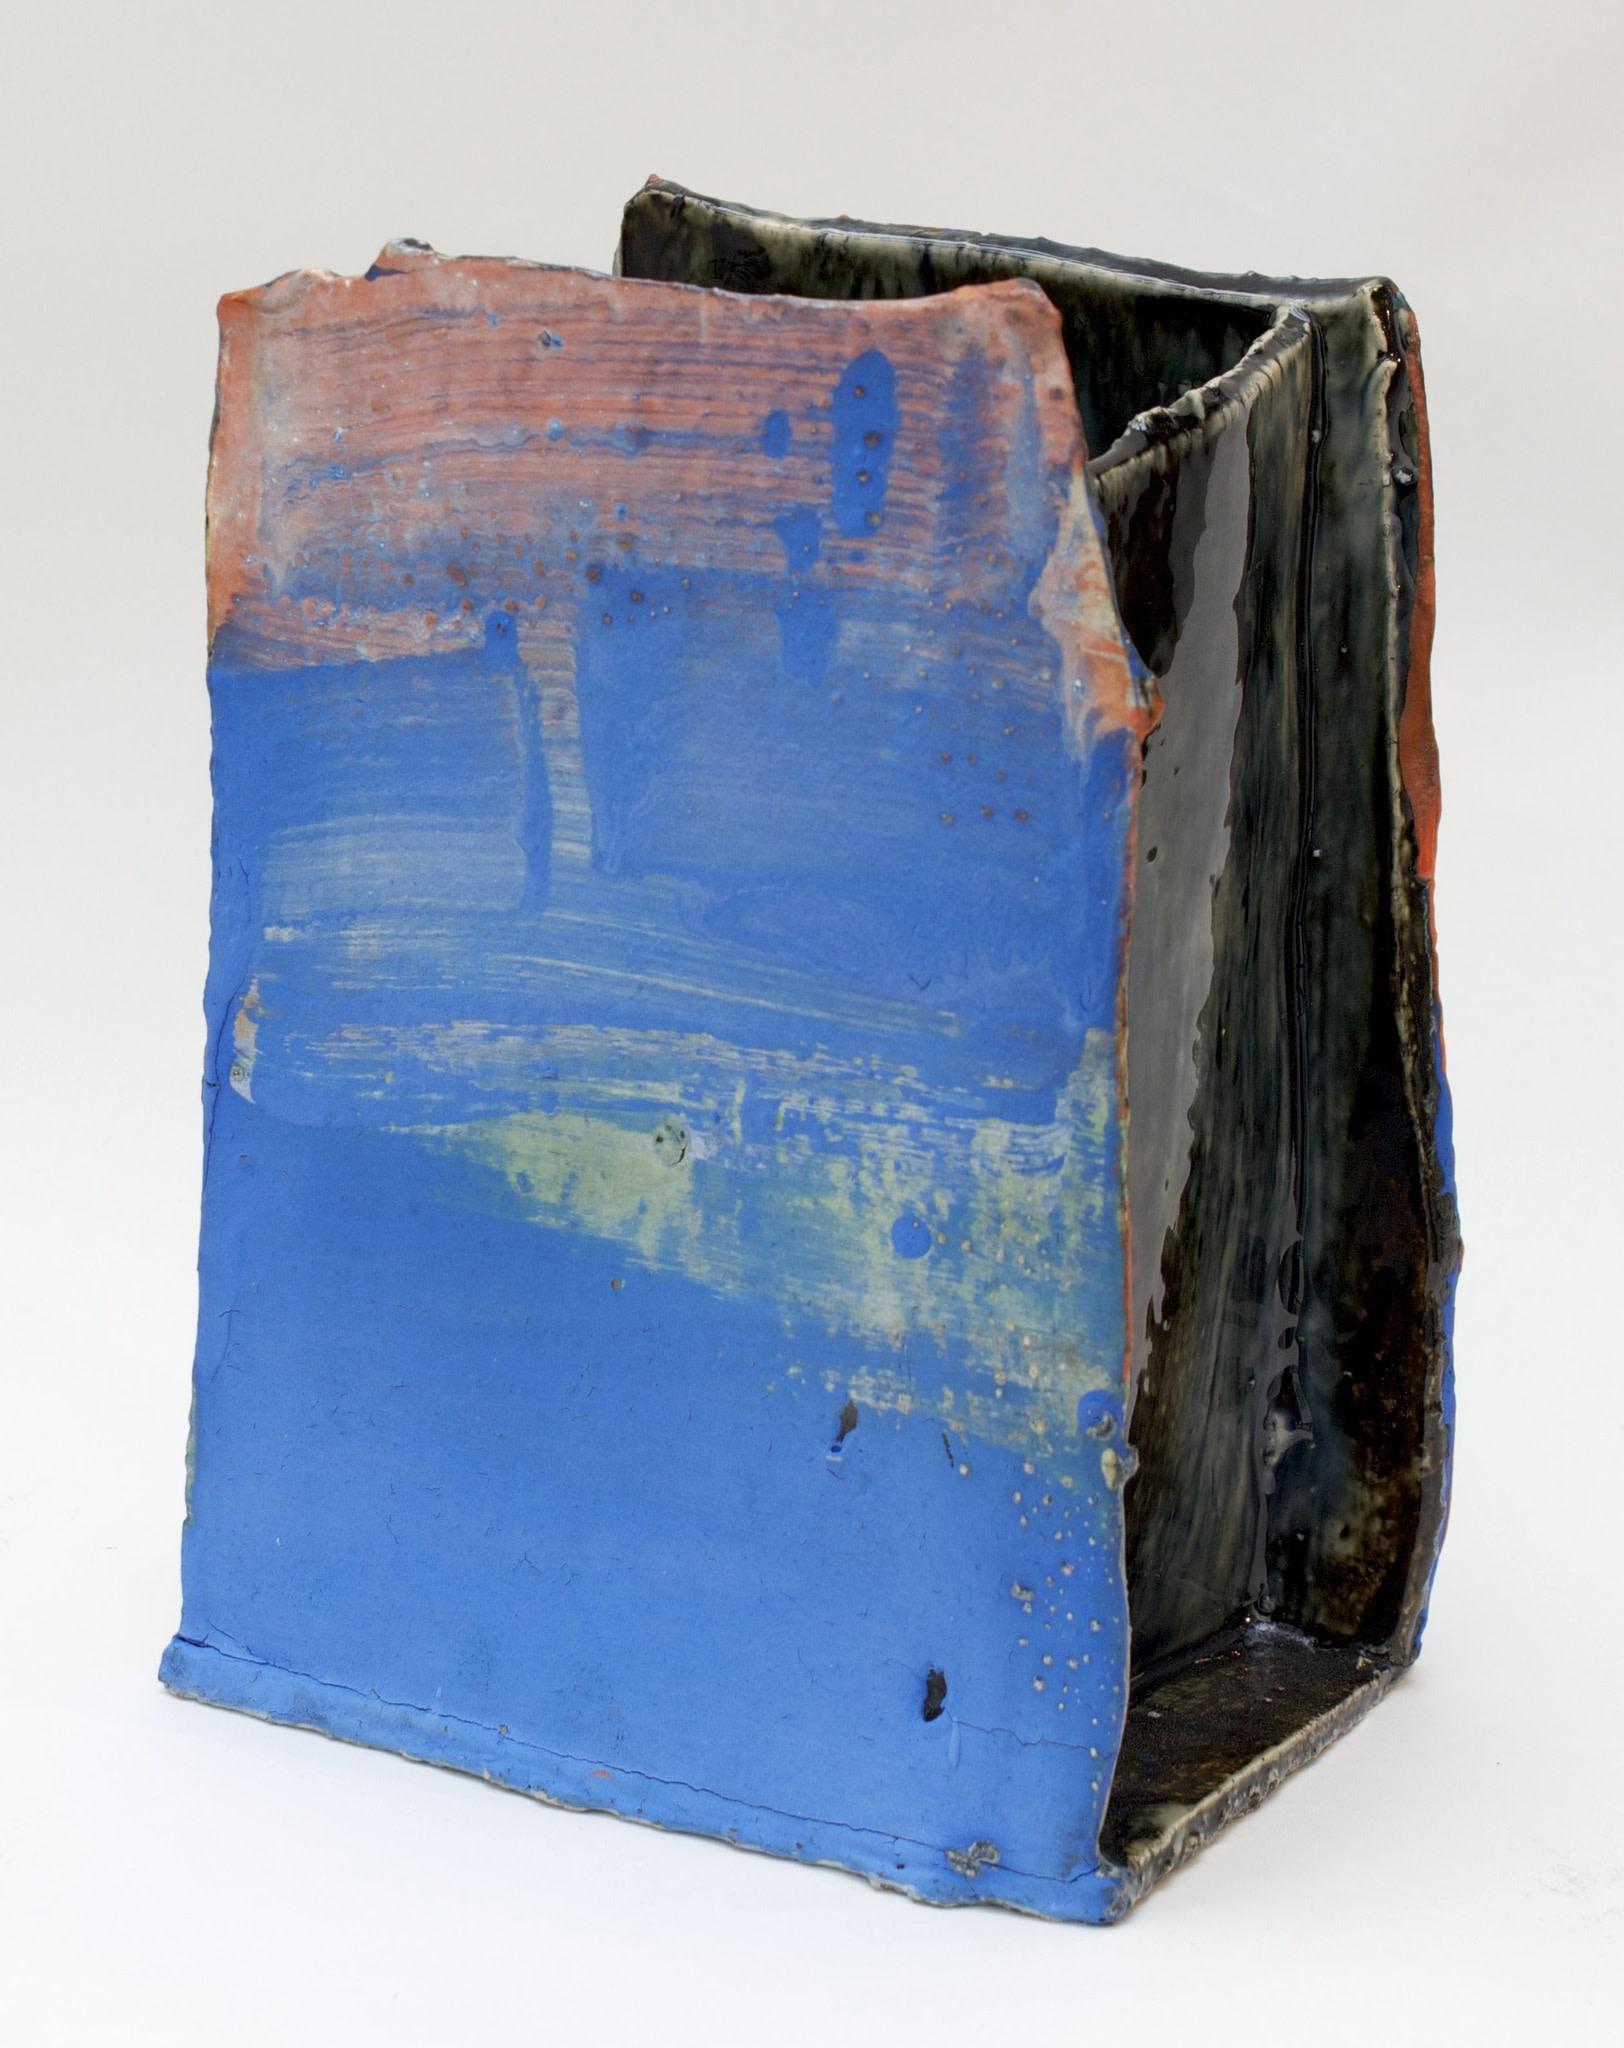 <span class=&#34;link fancybox-details-link&#34;><a href=&#34;/artists/34-barry-stedman/works/2532-barry-stedman-vessel-ocean-series-2014/&#34;>View Detail Page</a></span><div class=&#34;artist&#34;><strong>Barry Stedman</strong></div> <div class=&#34;title&#34;><em>Vessel 'Ocean Series'</em>, 2014</div> <div class=&#34;medium&#34;>earthenware</div> <div class=&#34;dimensions&#34;>h. 18 cm</div><div class=&#34;copyright_line&#34;>£ 20 x 10 Months, OwnArt 0% APR</div>